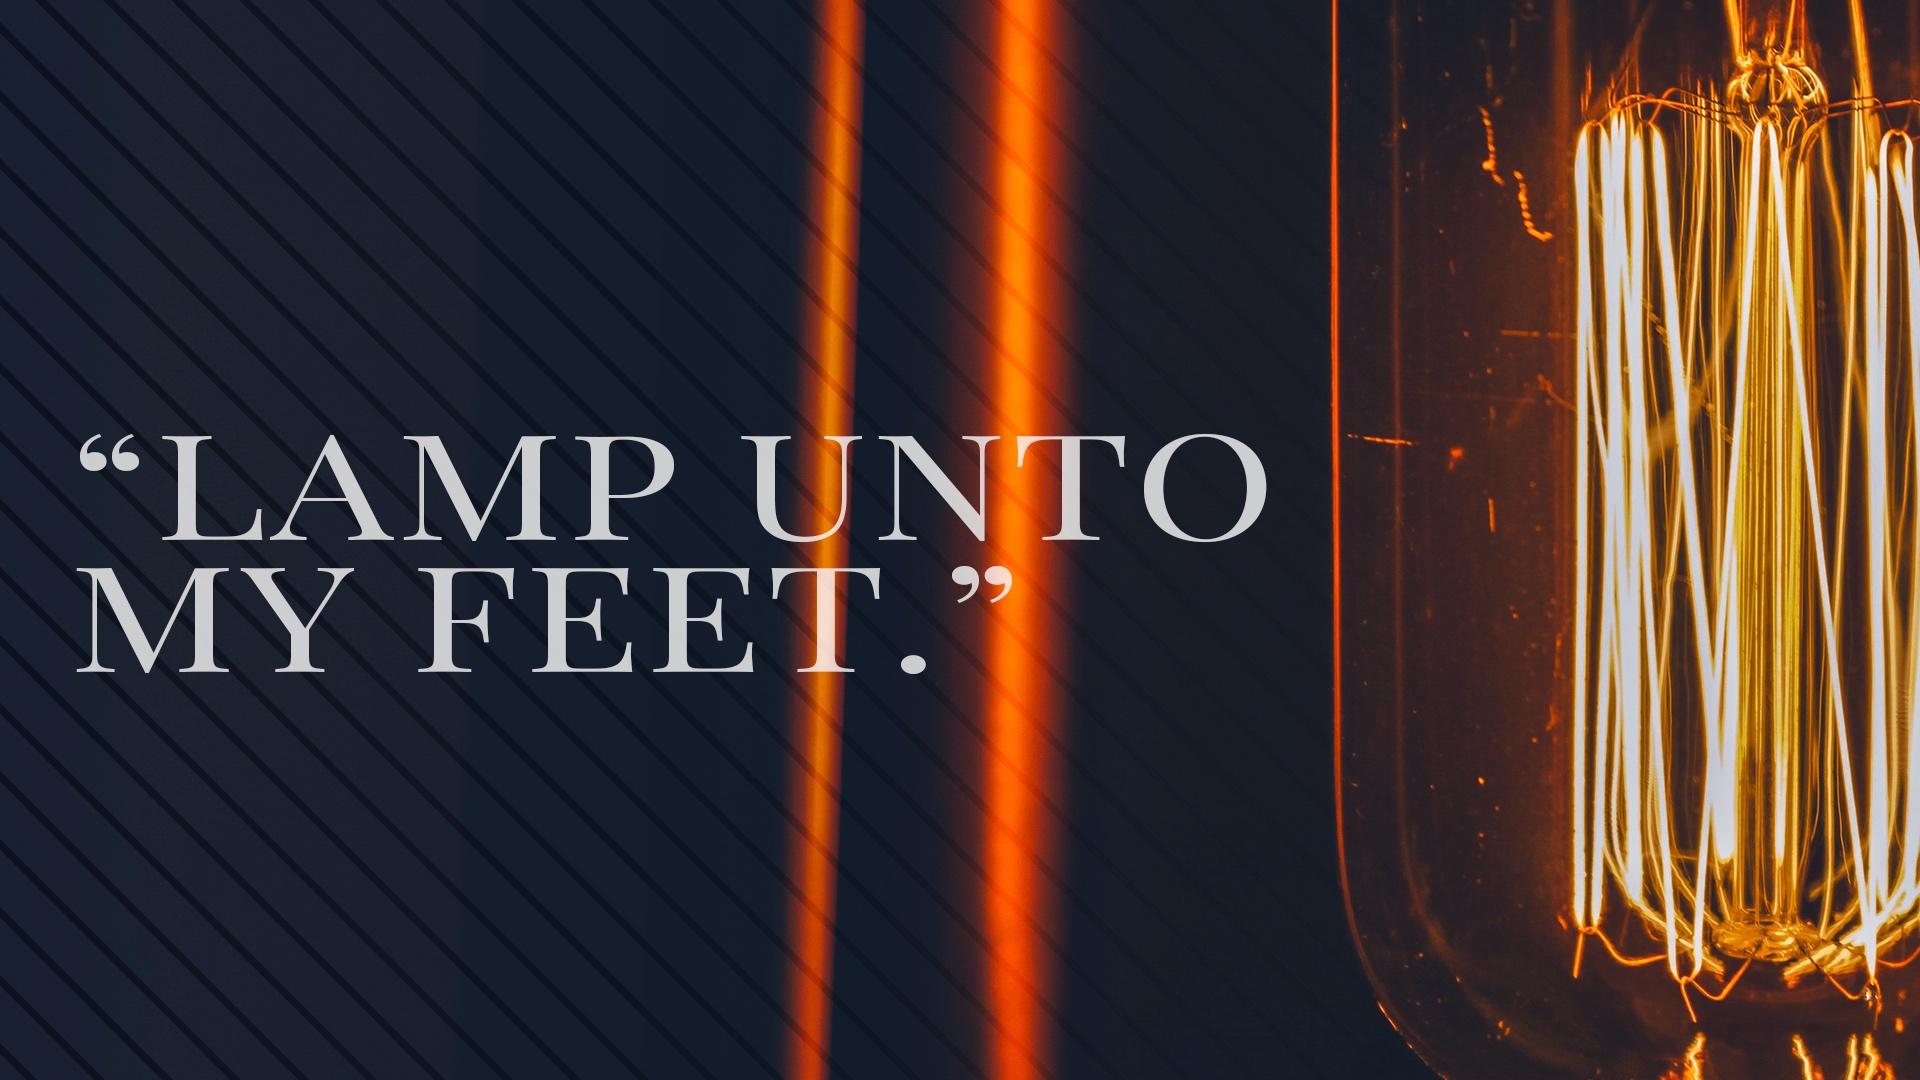 Lamp+unto+my+feet.jpg